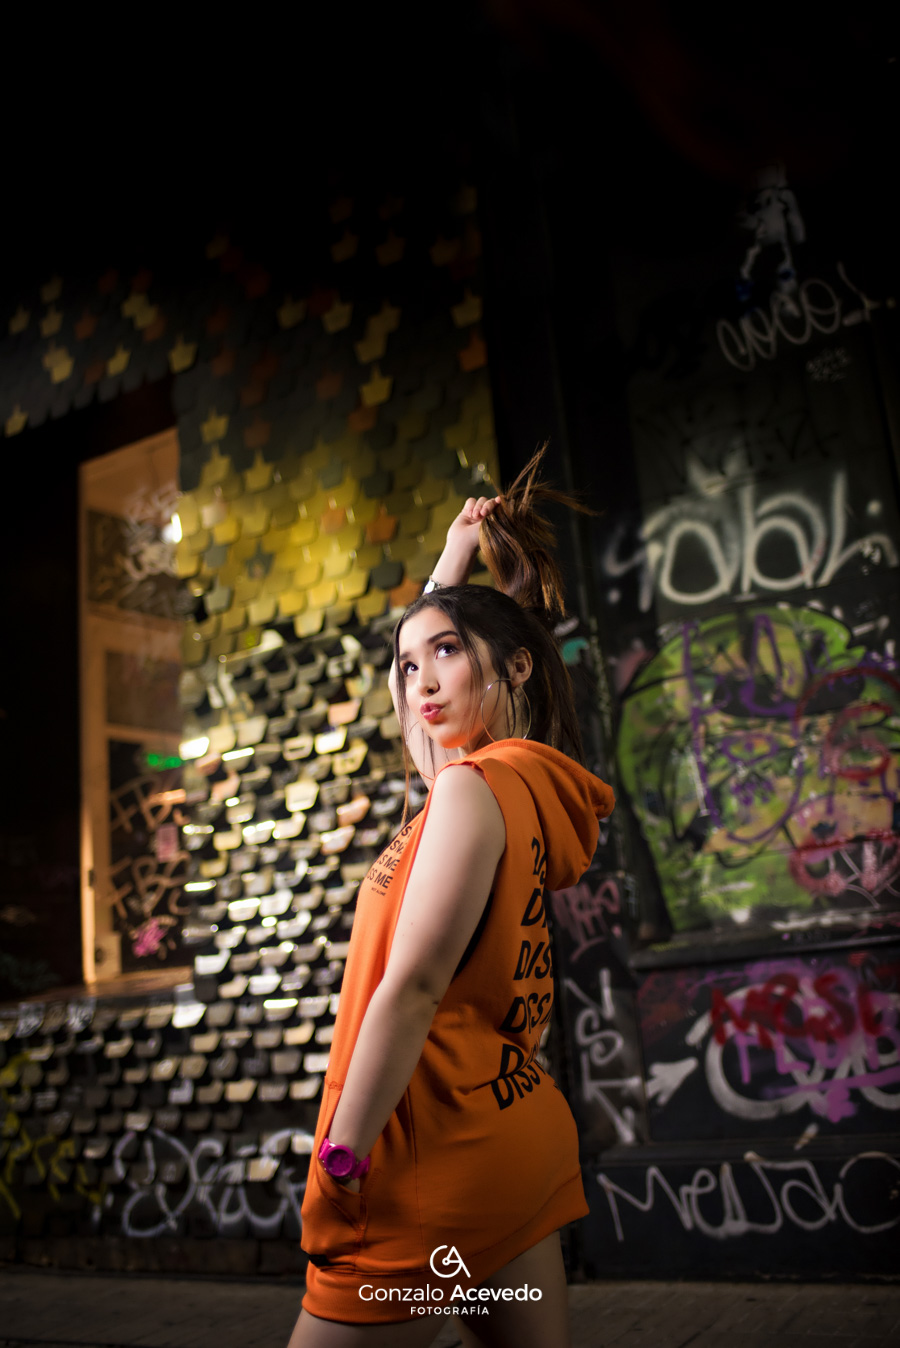 Book de Nare urbano en Palermo Fotos Narella Clausen Influencer Gonzalo Acevedo #gonzaloacevedofotografia